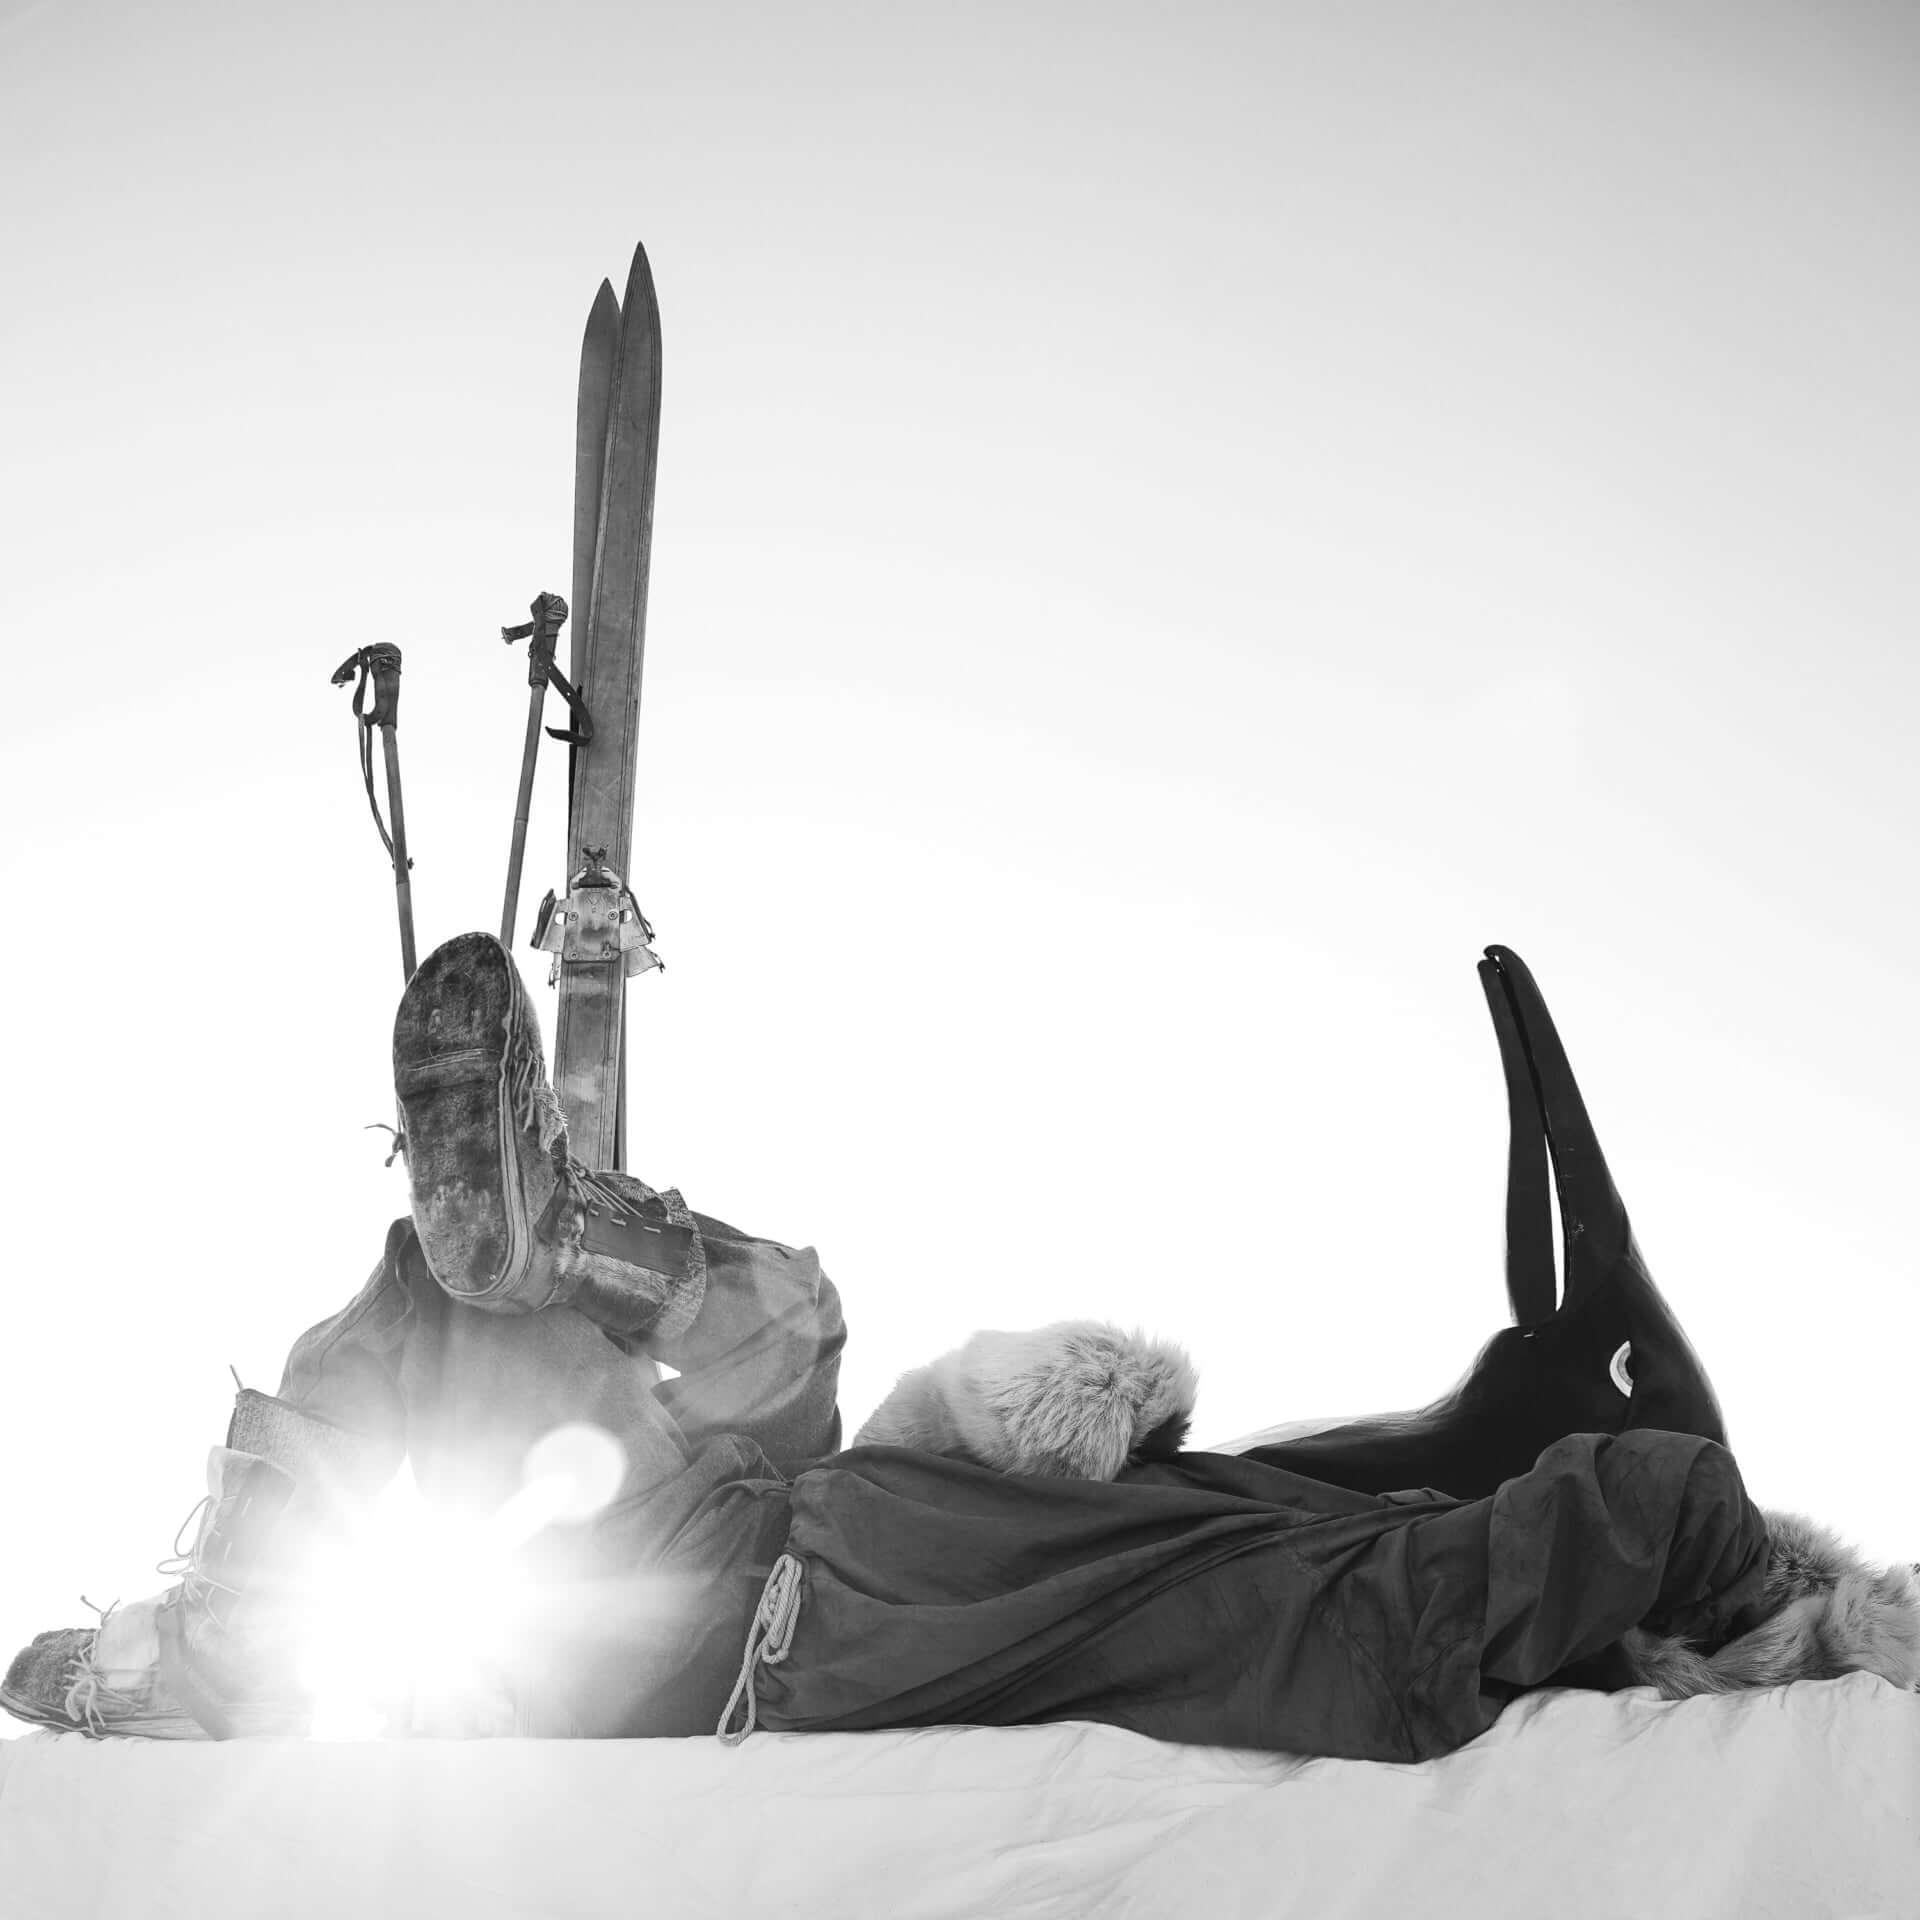 Penguin Cafeインタビュー|南極のペンギン達に捧げた新作『Handfuls Of Night』の世界観を紐解く interview_penguincafe_artist_2-1920x1920